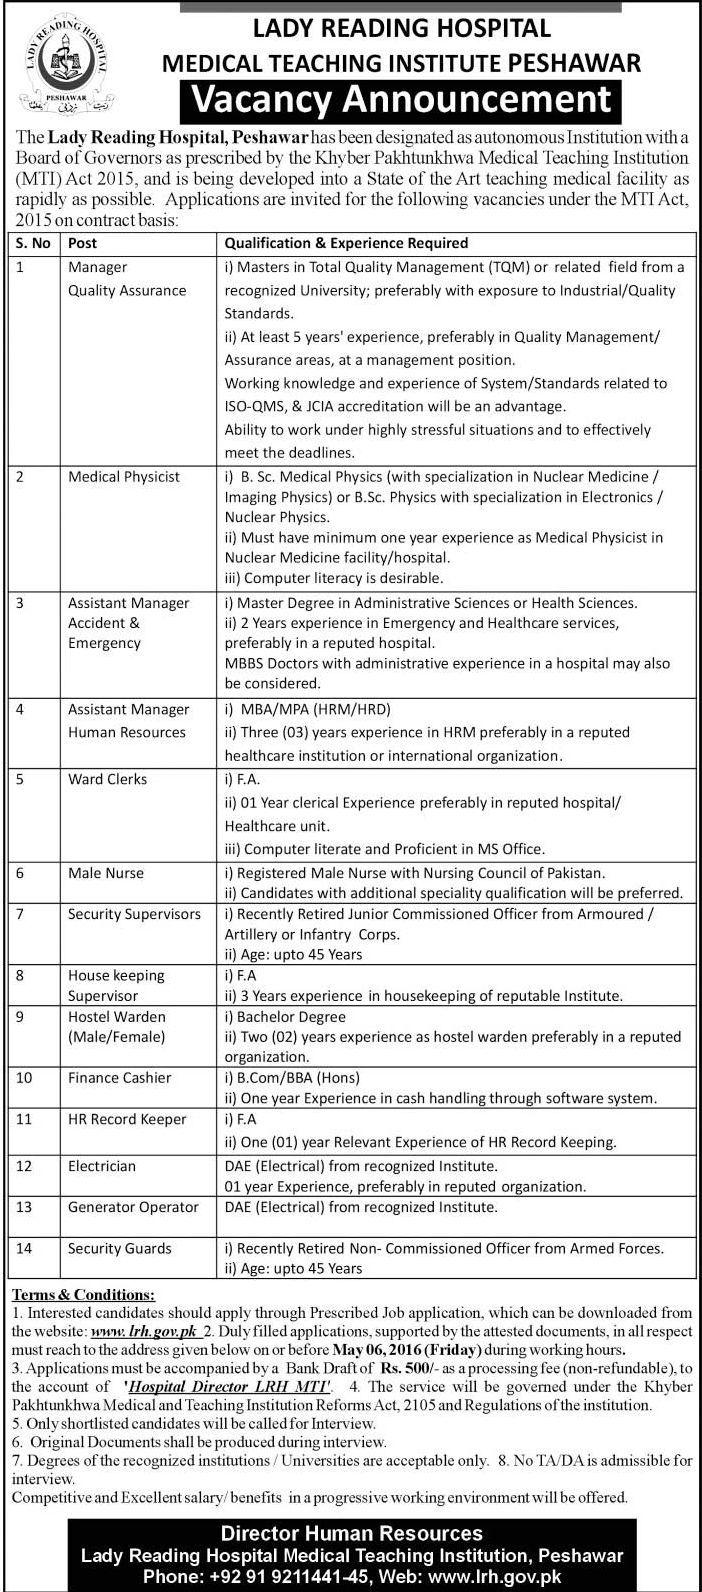 Lady Reading Hospital Peshawar Jobs 2016